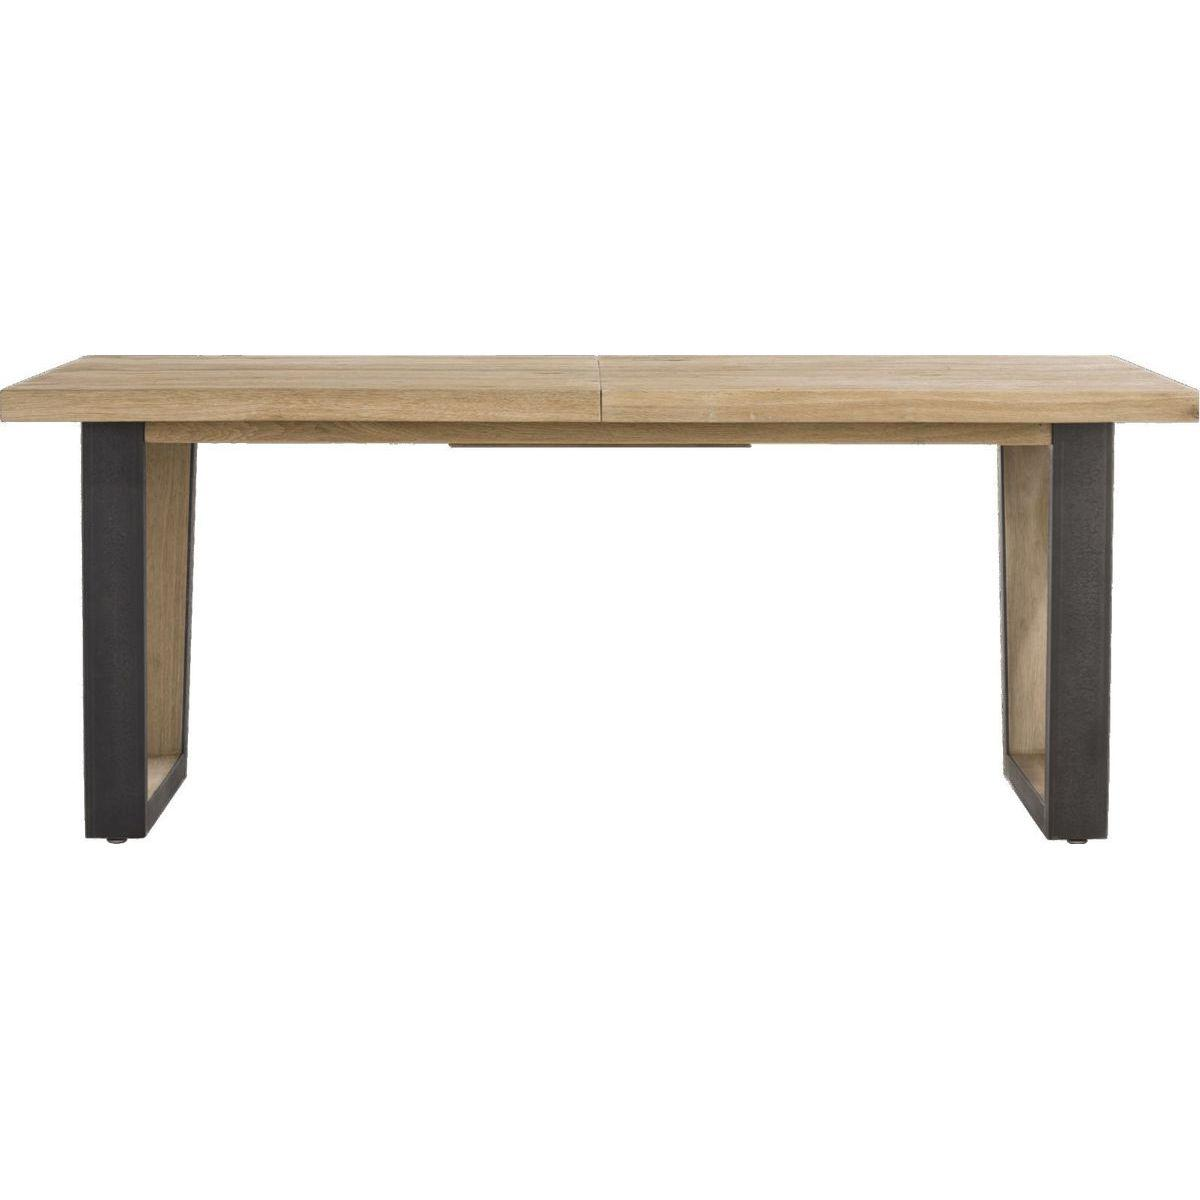 Table à rallonge 100x160cm/+50cm METALOX HetH pieds V métal-bois